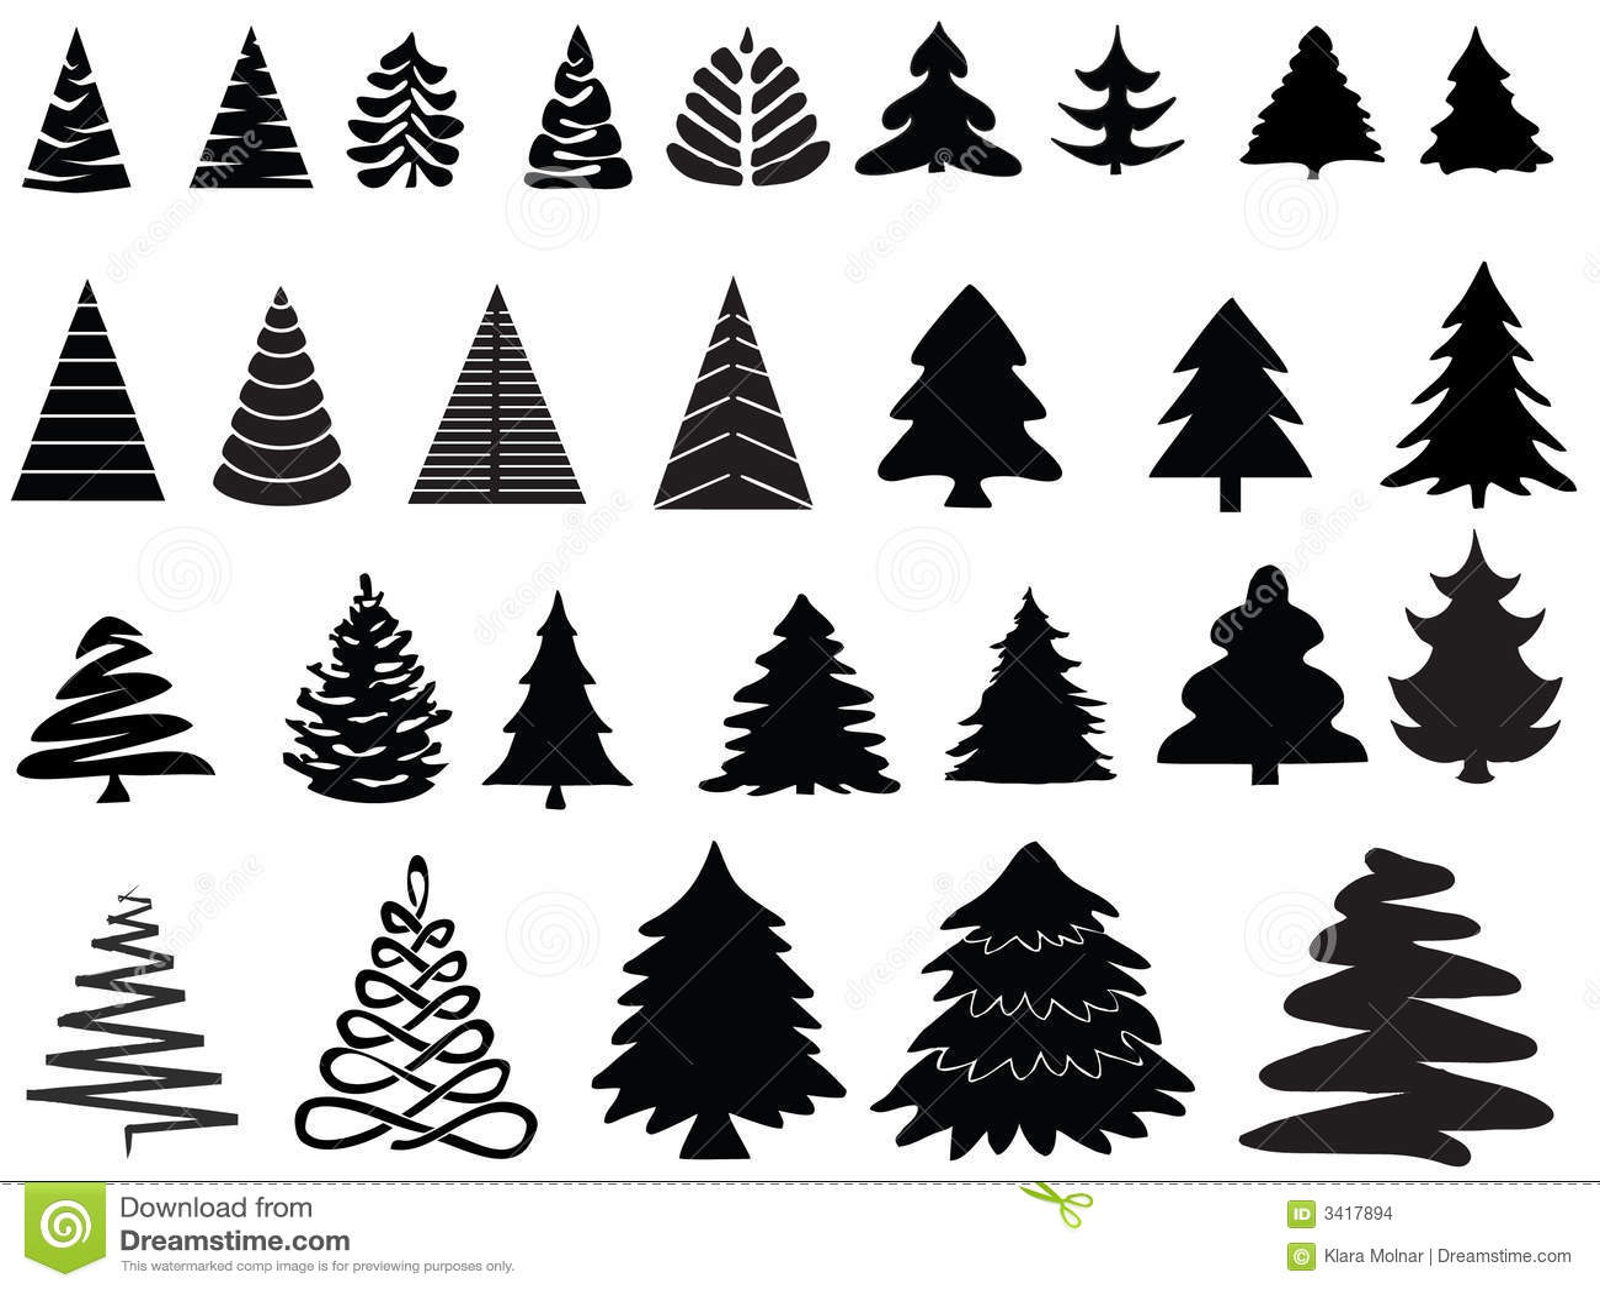 Pine Tree Stencil Silhouette of pine trees.